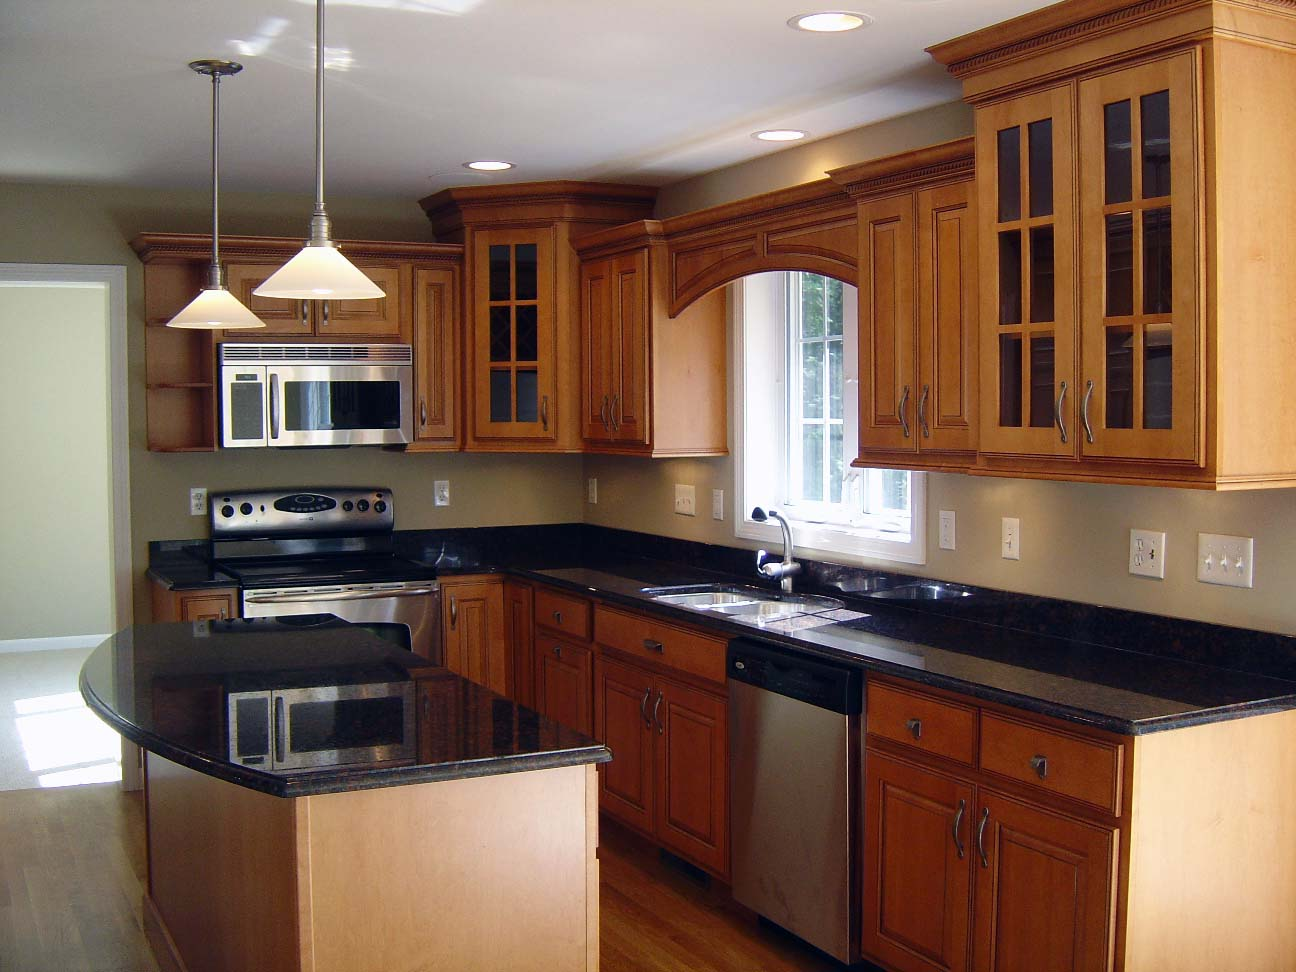 dapur dengan kesan kuno tapi jauh dari kata ndeso » Kegiatan Memasak Menjadi Lebih Menyenangkan di Dapur yang Menggembirakan